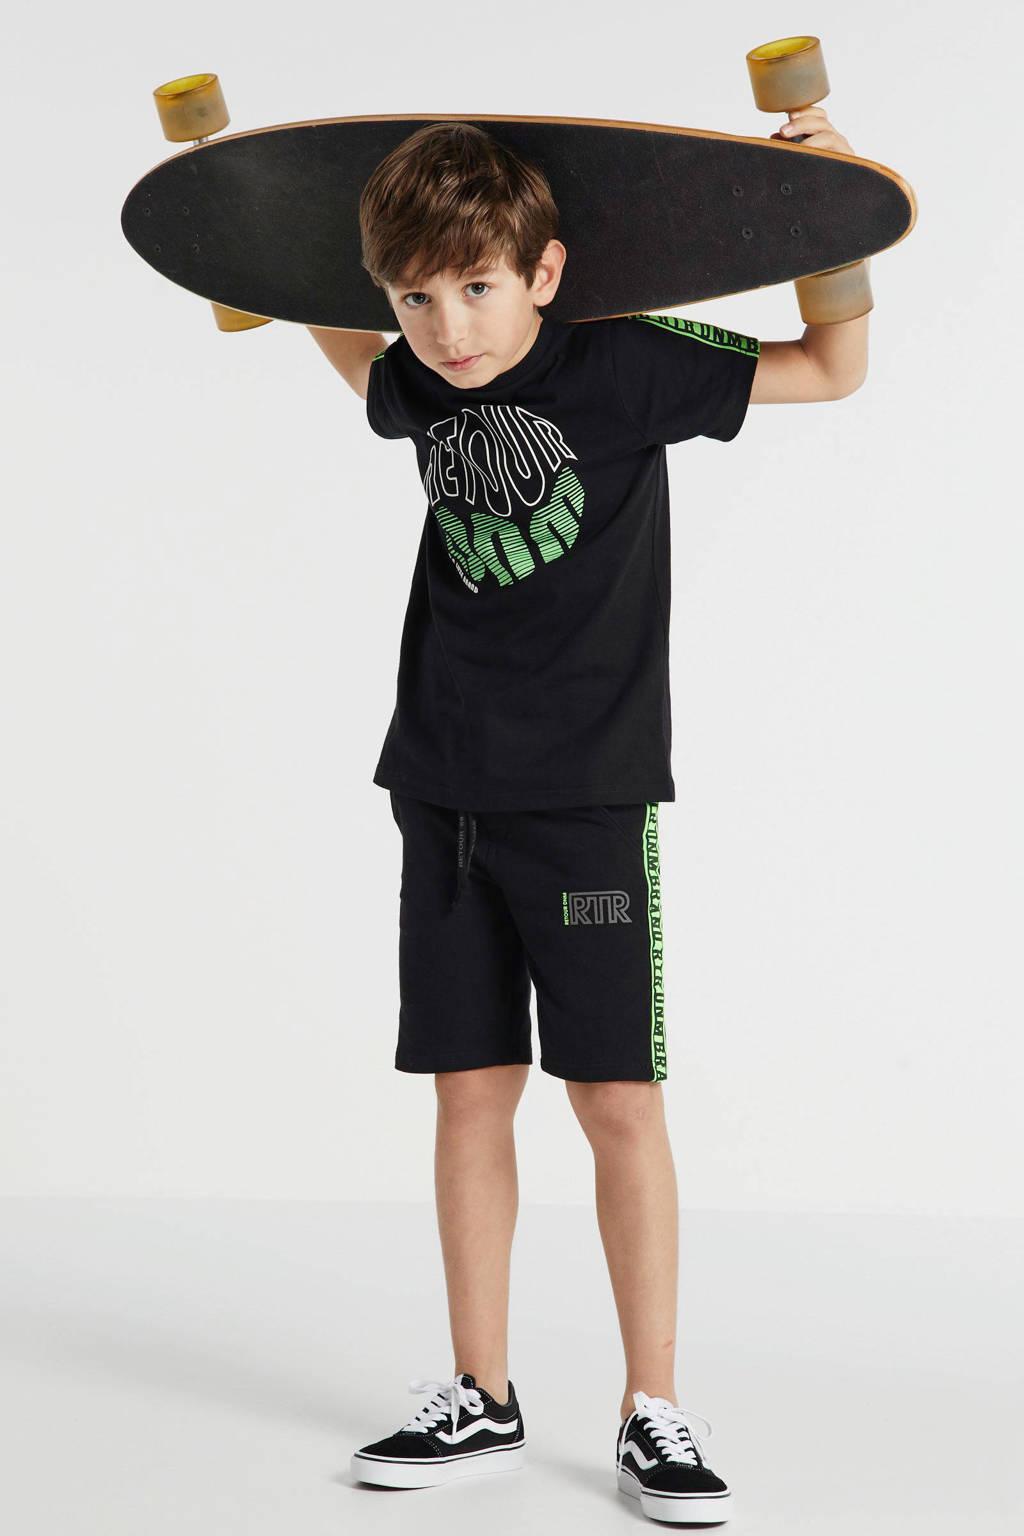 Retour Denim T-shirt Charlie met printopdruk zwart/groen/wit, Zwart/groen/wit